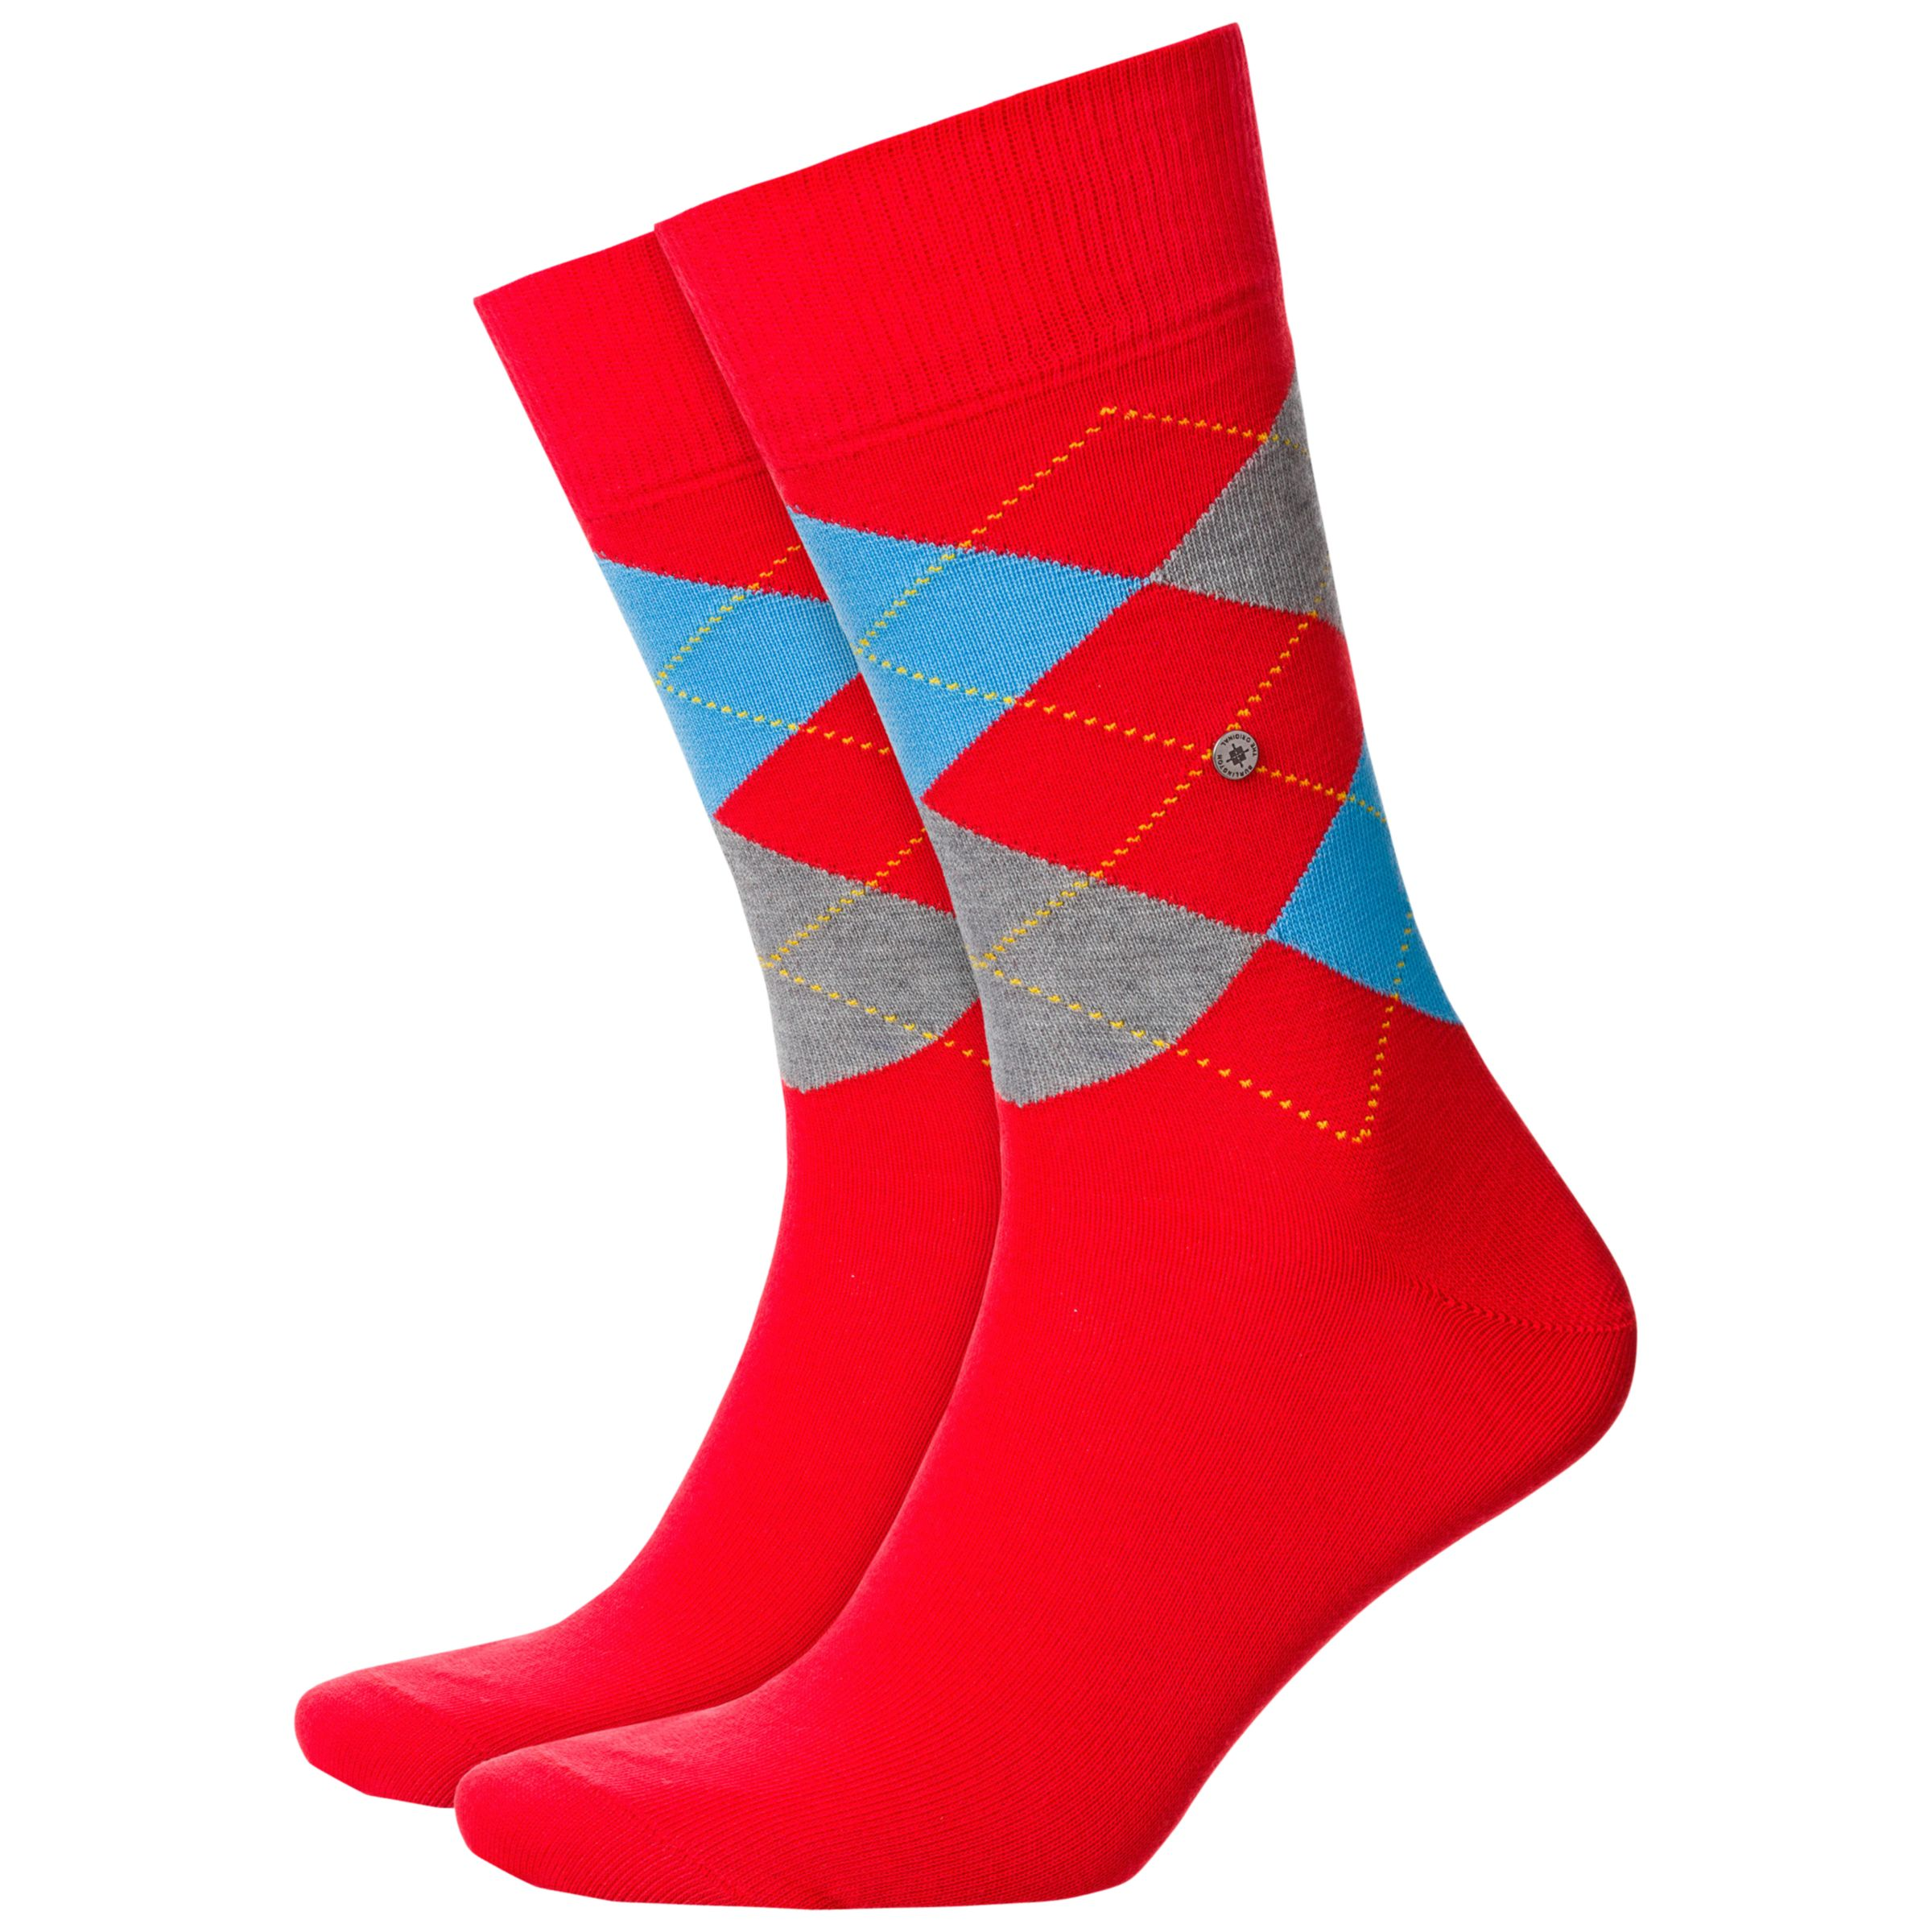 Burlington Burlington King Size Argyle Socks, One Size, Red